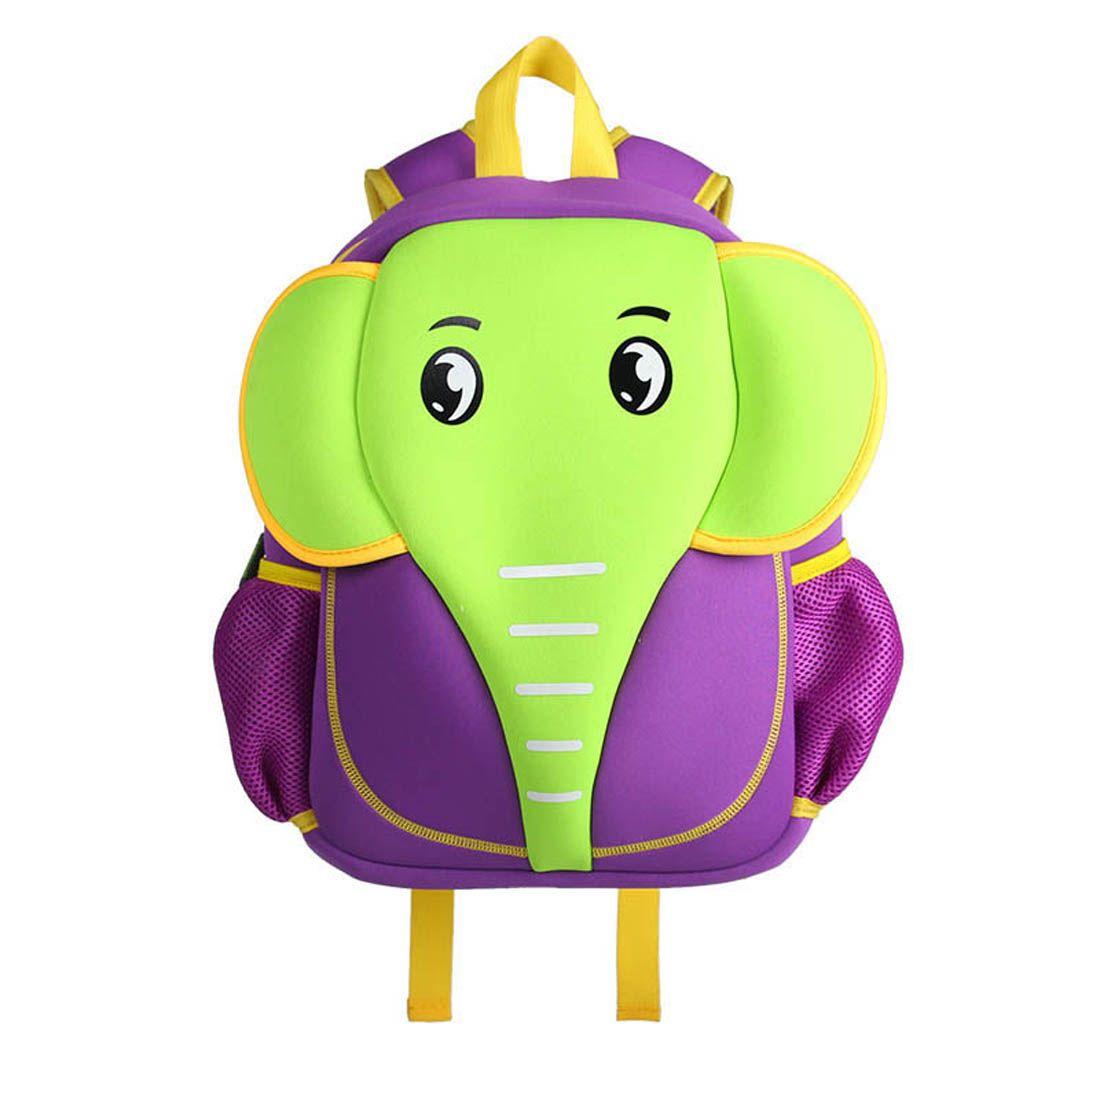 07bd506d3a55 3D School Bag Waterproof Animals Cartoon Elephant Backpack Neoprene Kids  Baby Bags Children School Bags For Girls Boys Mochila Children Backpack  Cheap ...